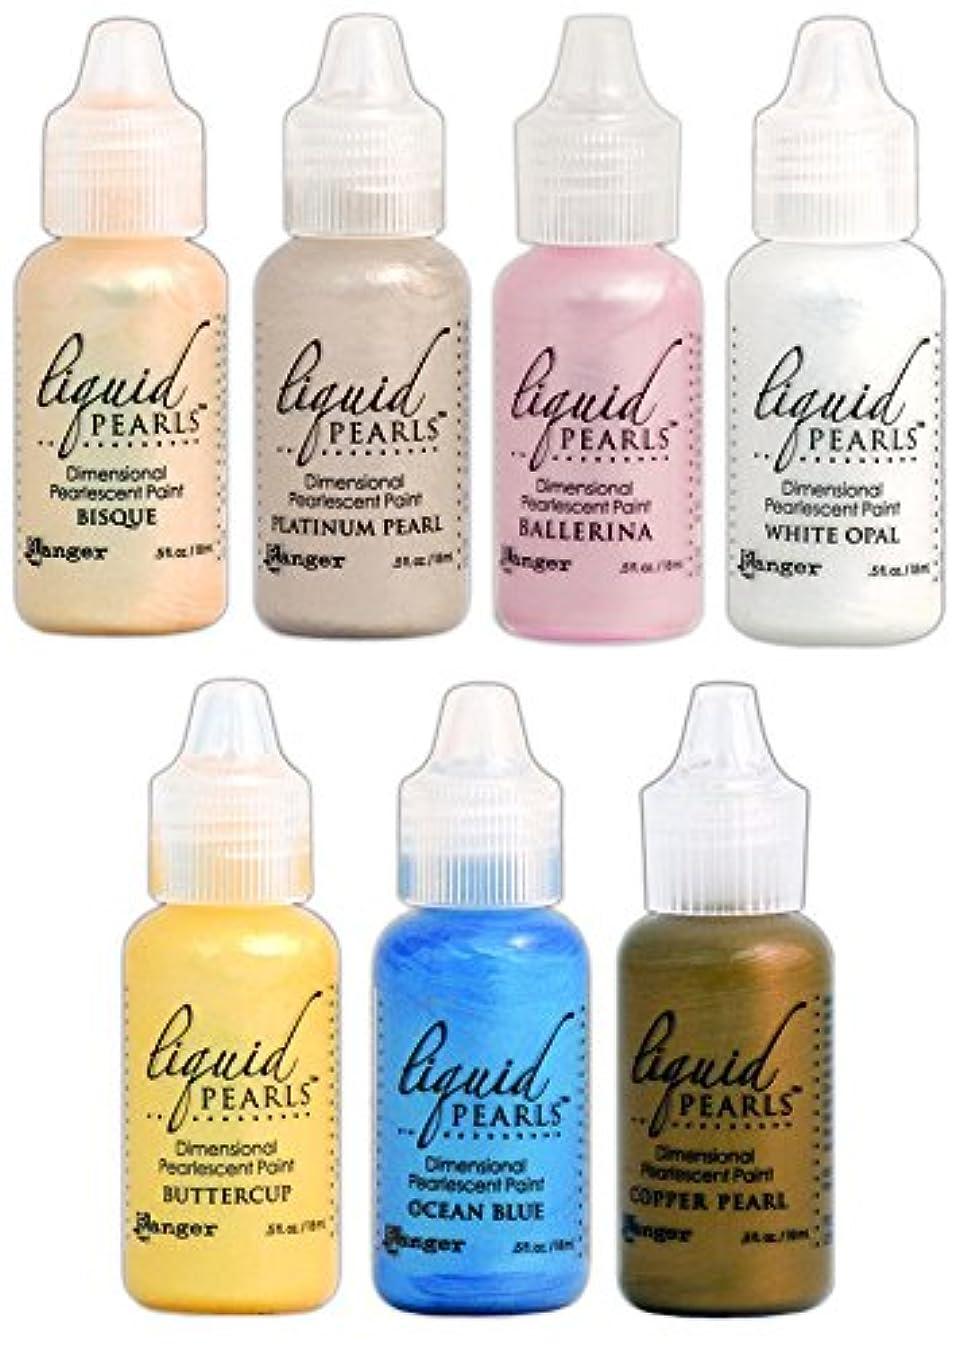 Ranger - Liquid Pearls Favorites Bundle of 7 Colors - Ballerina, Copper Pearl, Platinum Pearl, White Opal, Bisque, Buttercup and Ocean Blue t2305693551